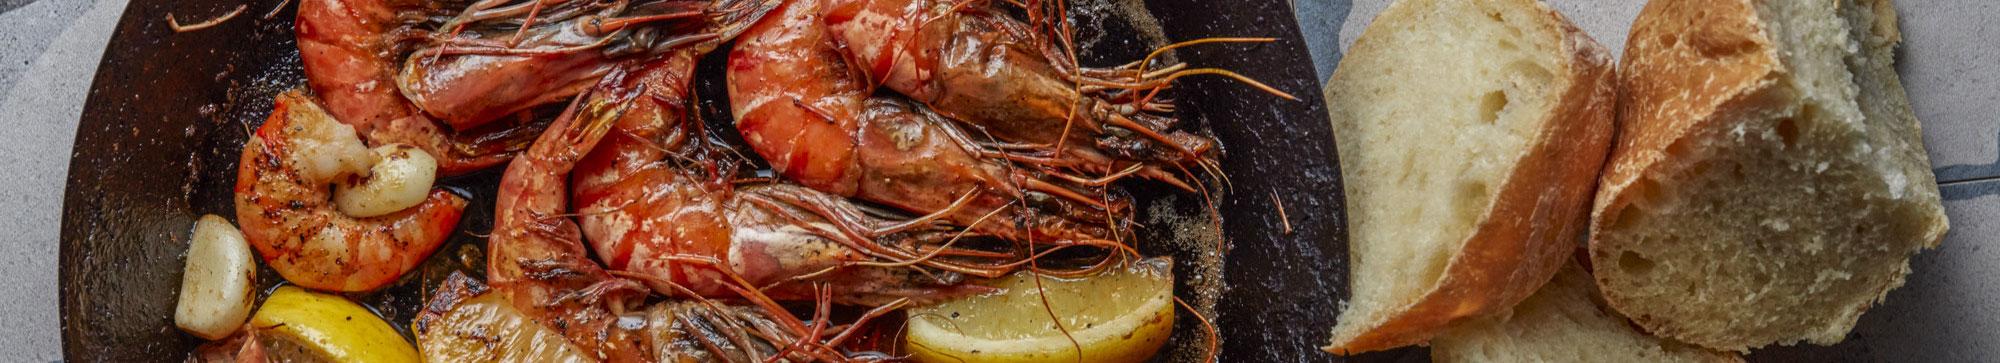 seasonal menu restaurant Chesterfield